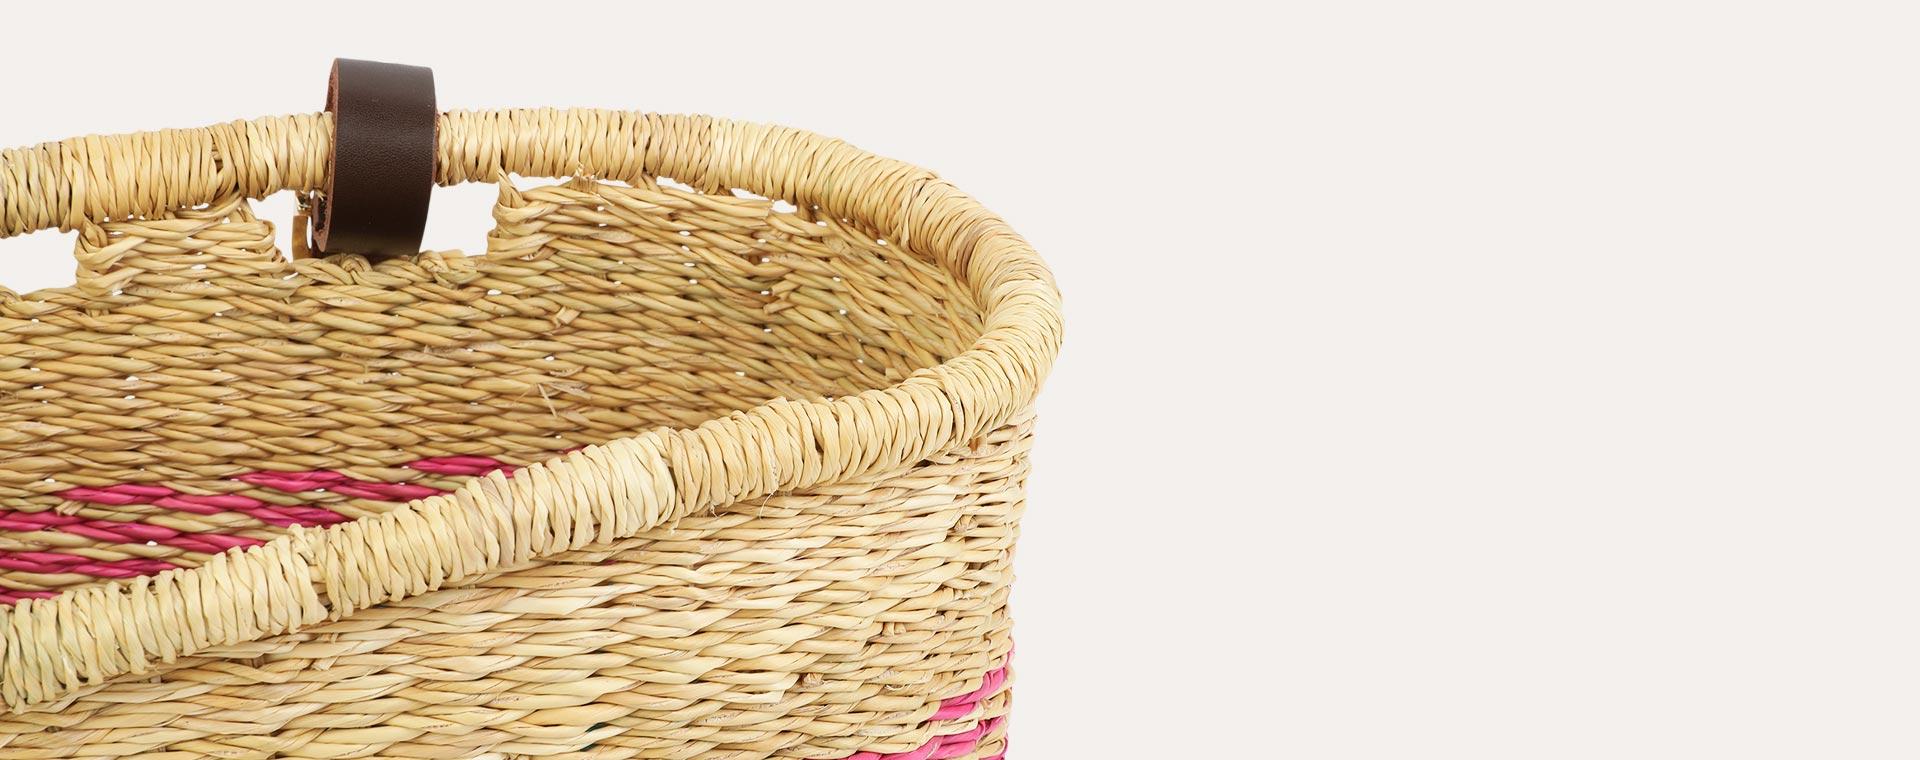 Pink/Turquoise The Basket Room Bike Basket